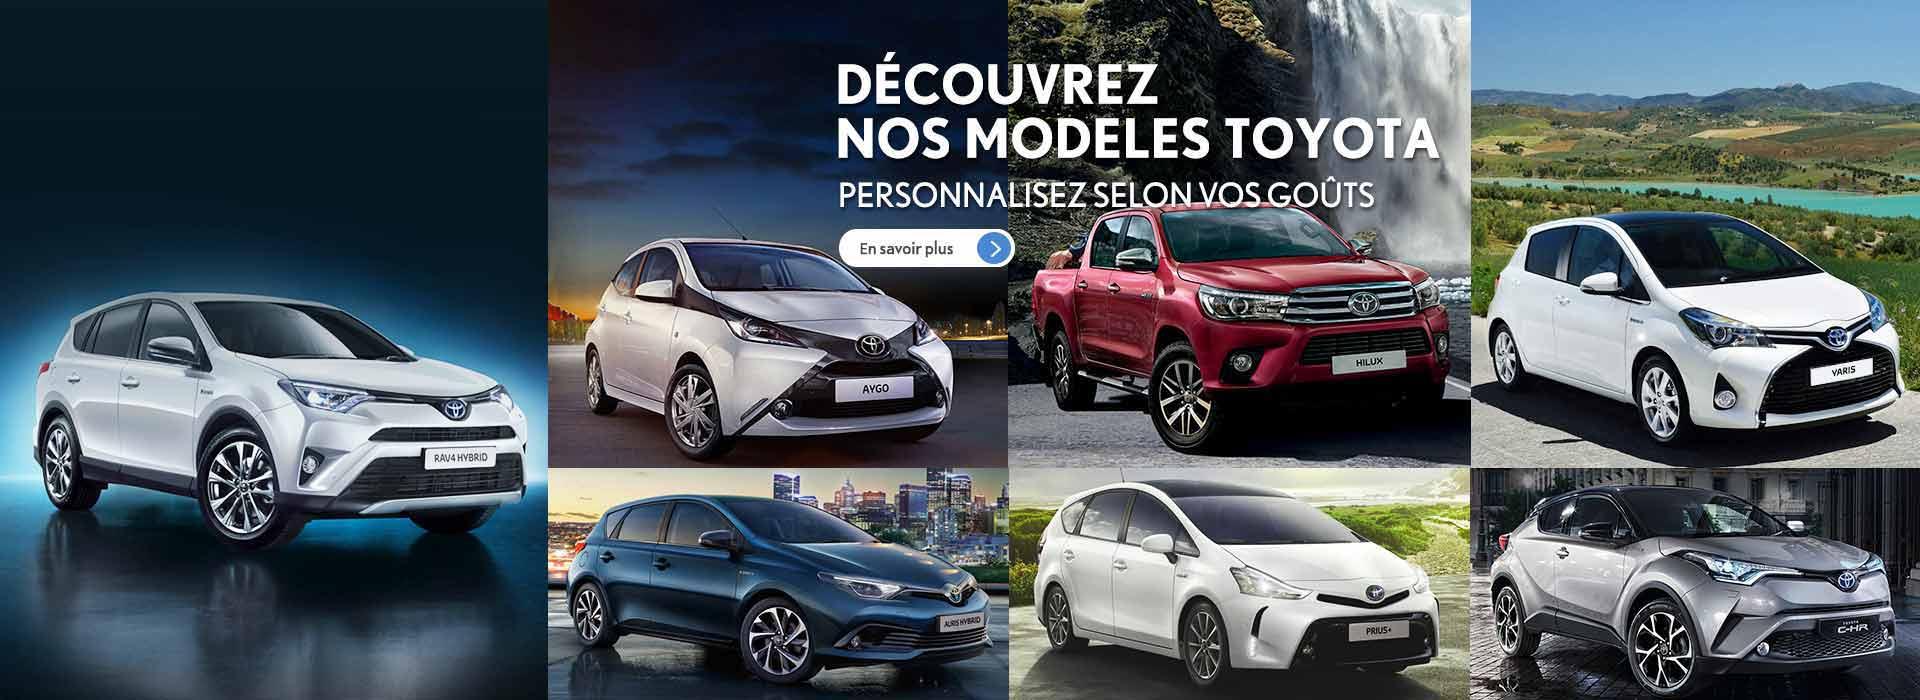 Modèles Toyota